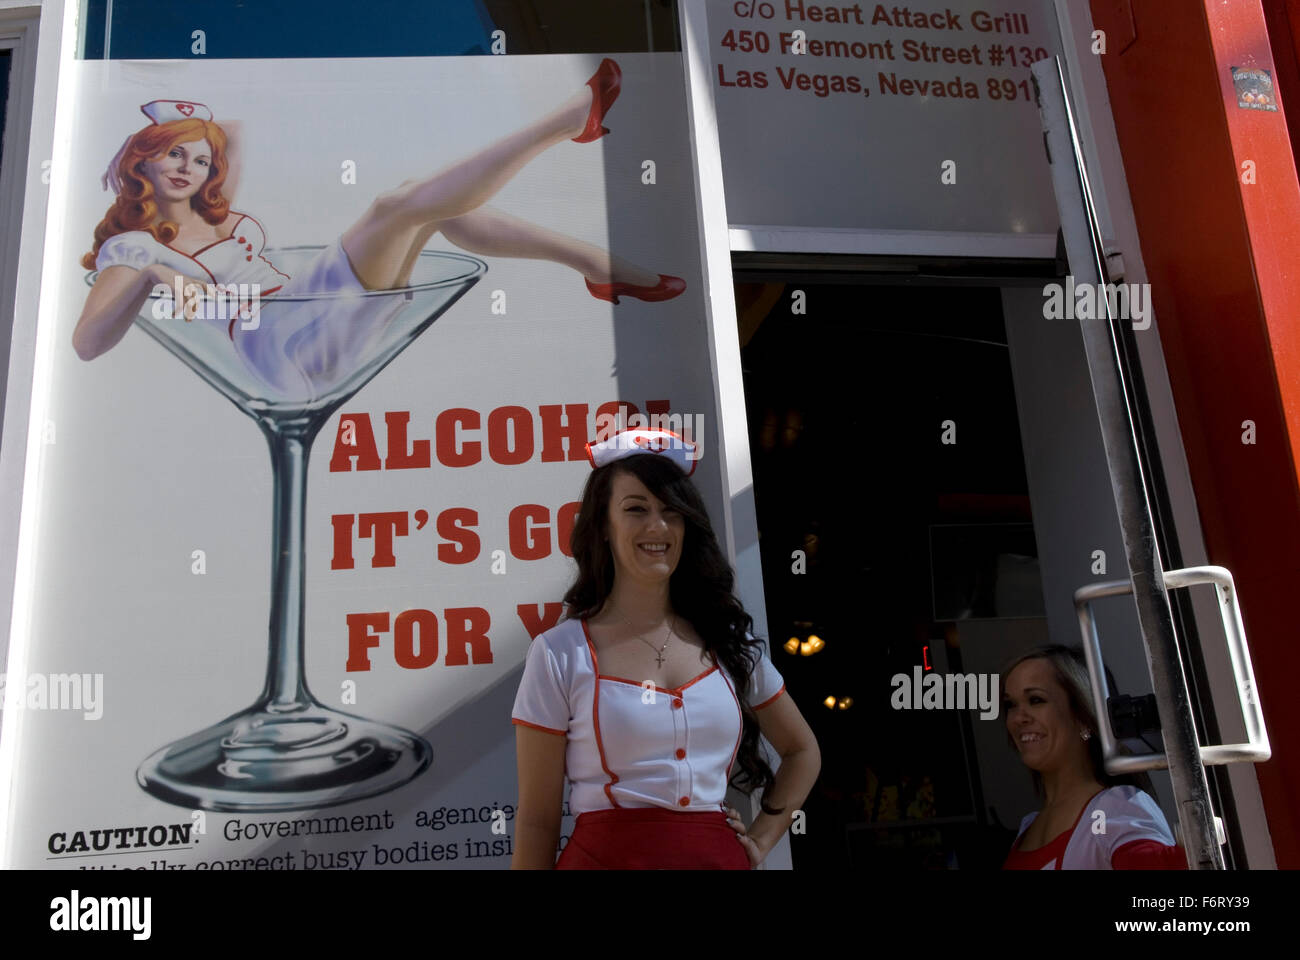 Heart Attack Grill Fremont St. Las Vegas Nevada, USA Stockfoto